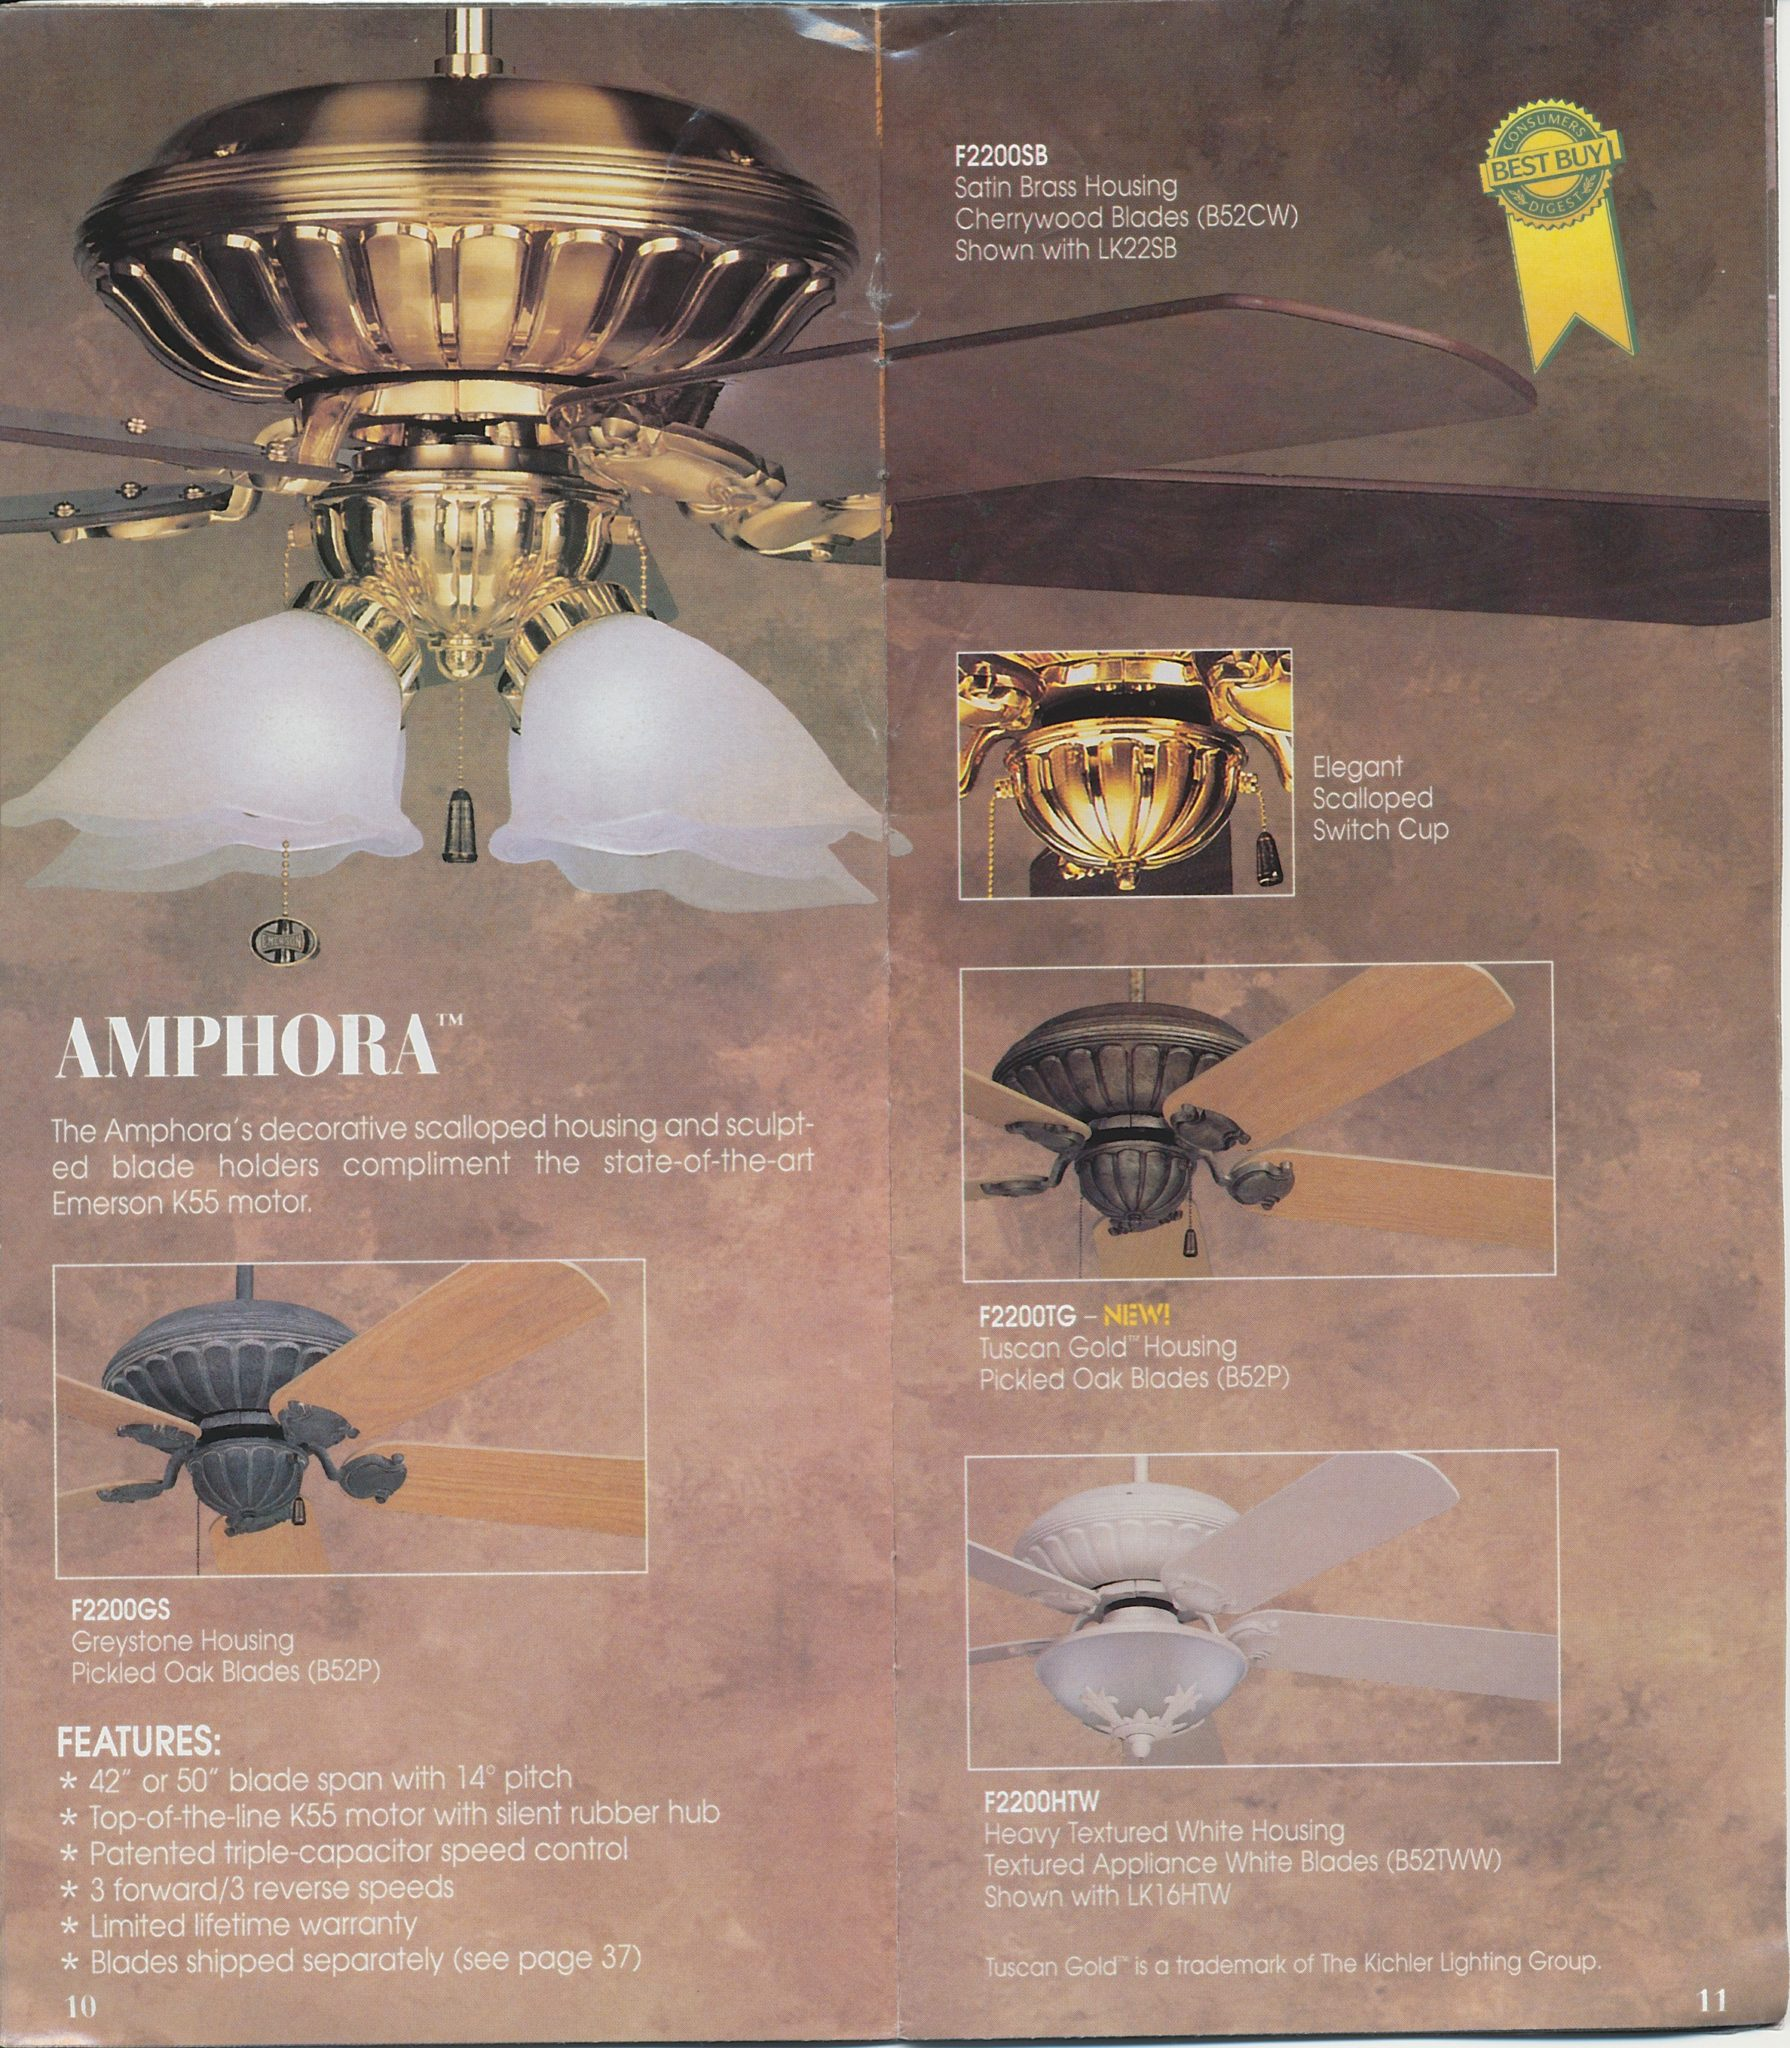 Emerson catalog 1997 for The emrson